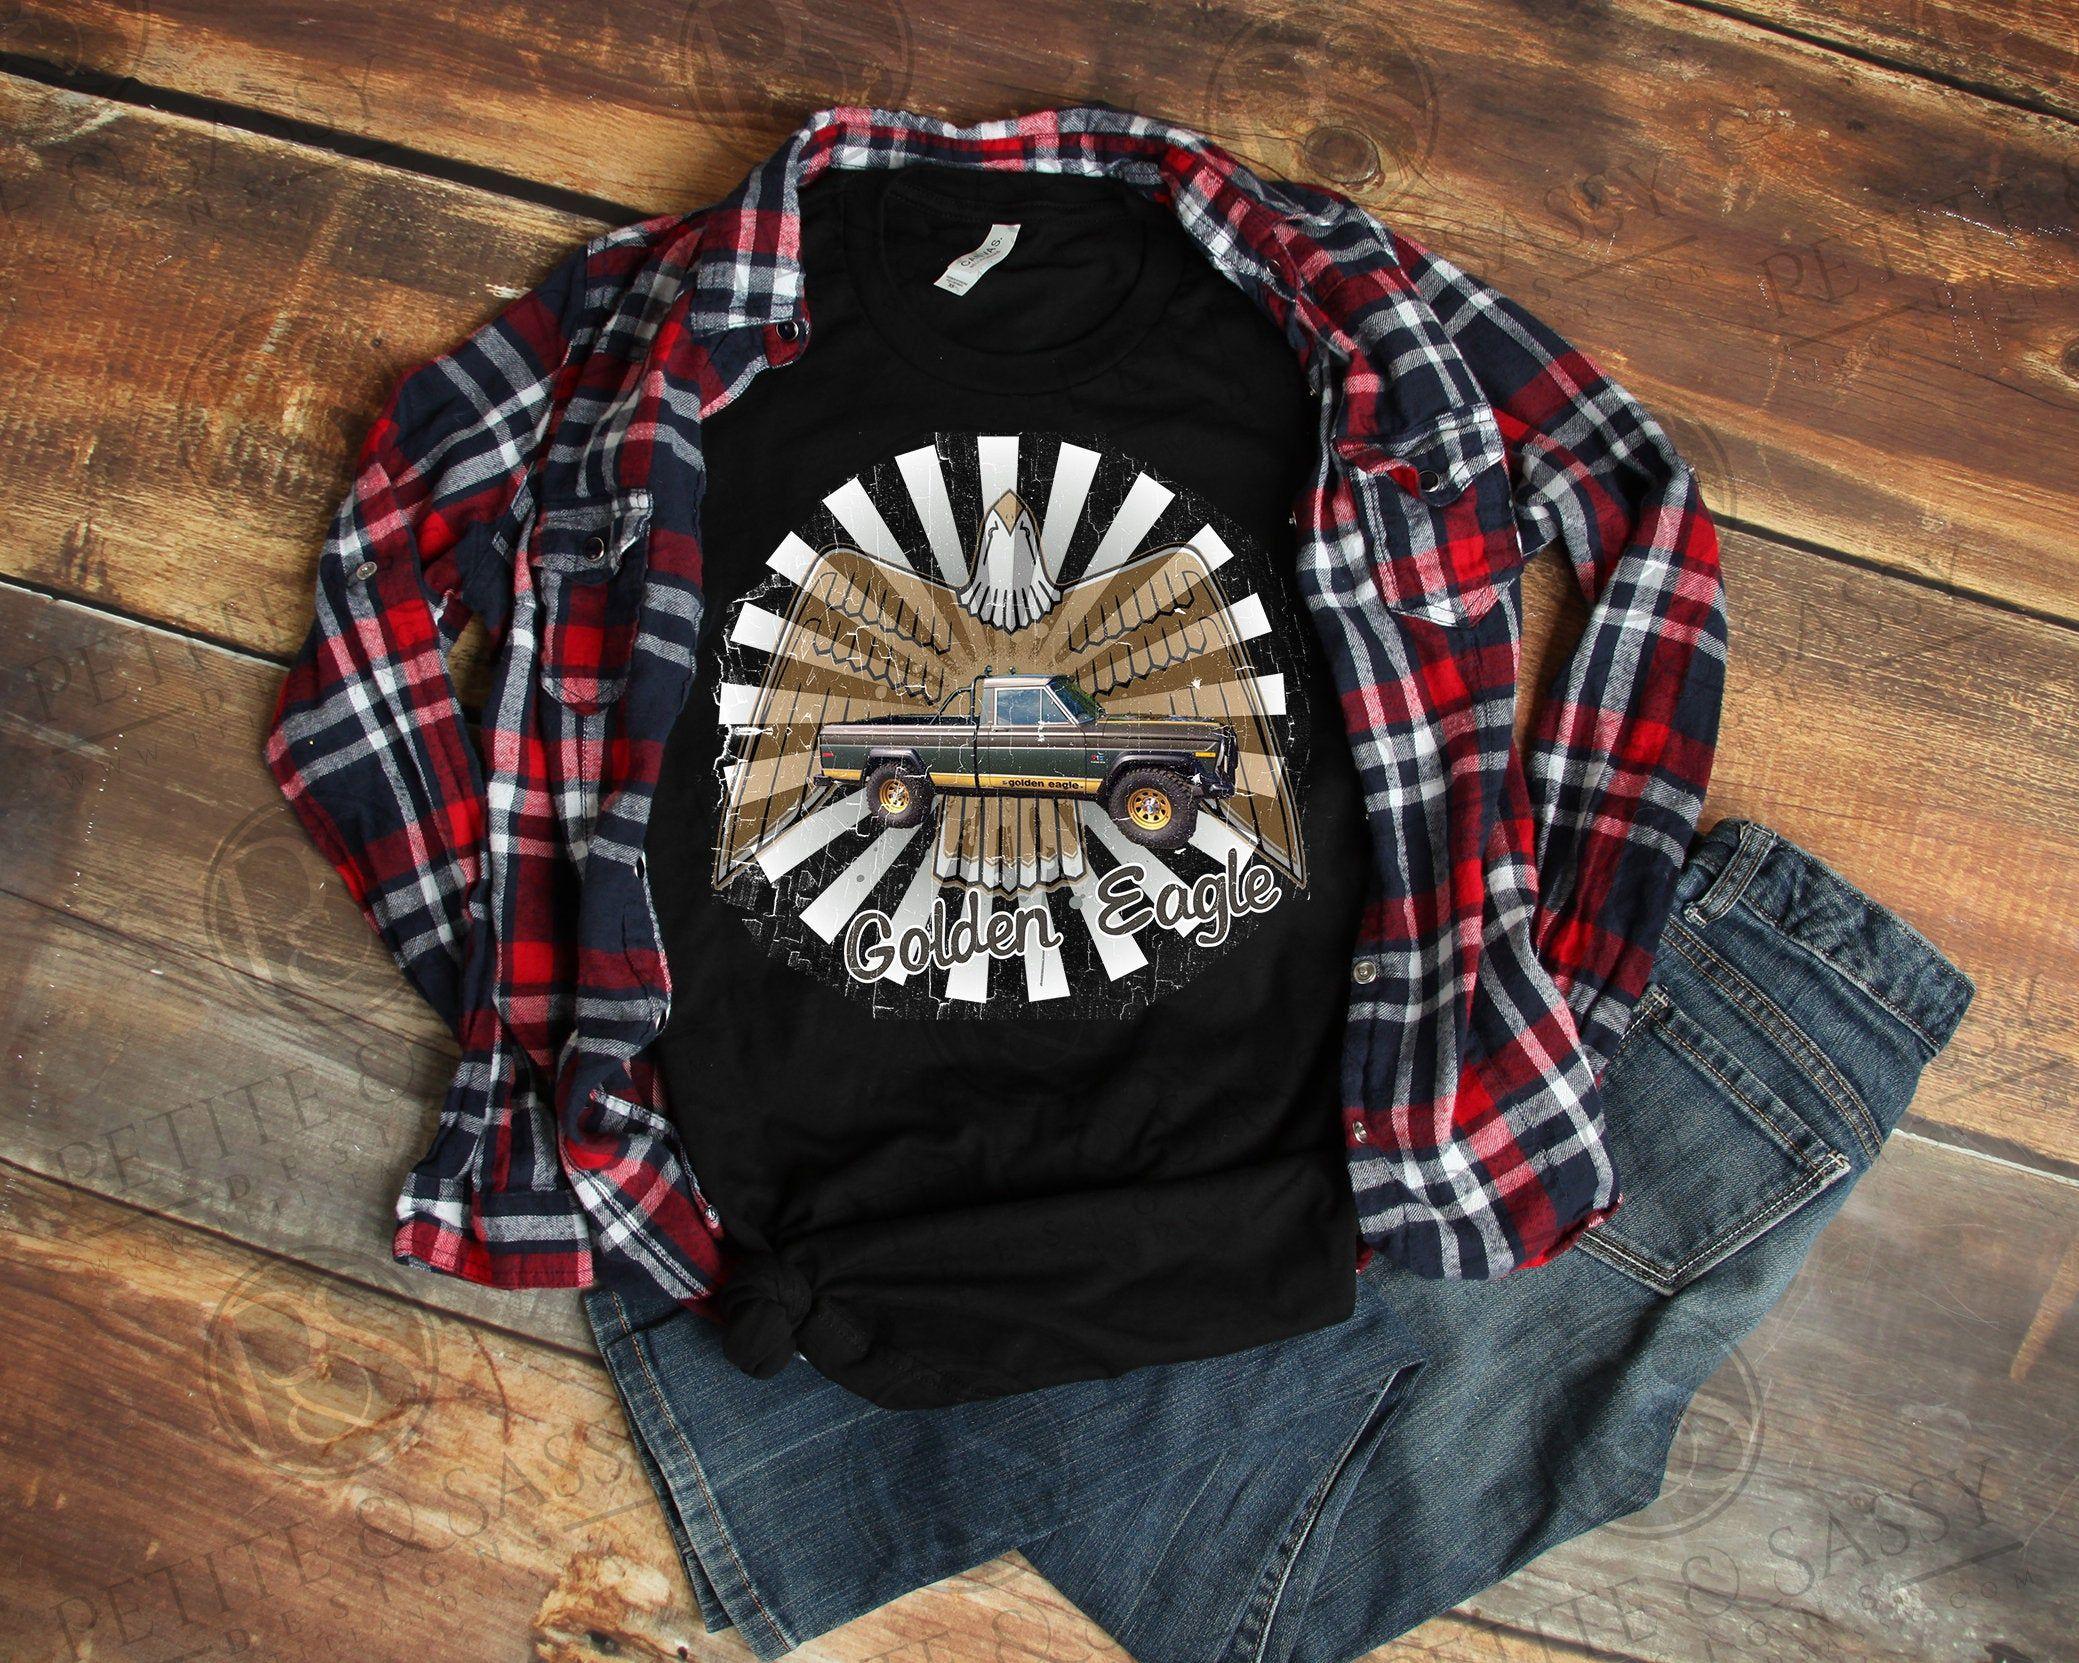 Vintage Look Golden Eagle Jeep T Shirt Vintage Looks Shirts